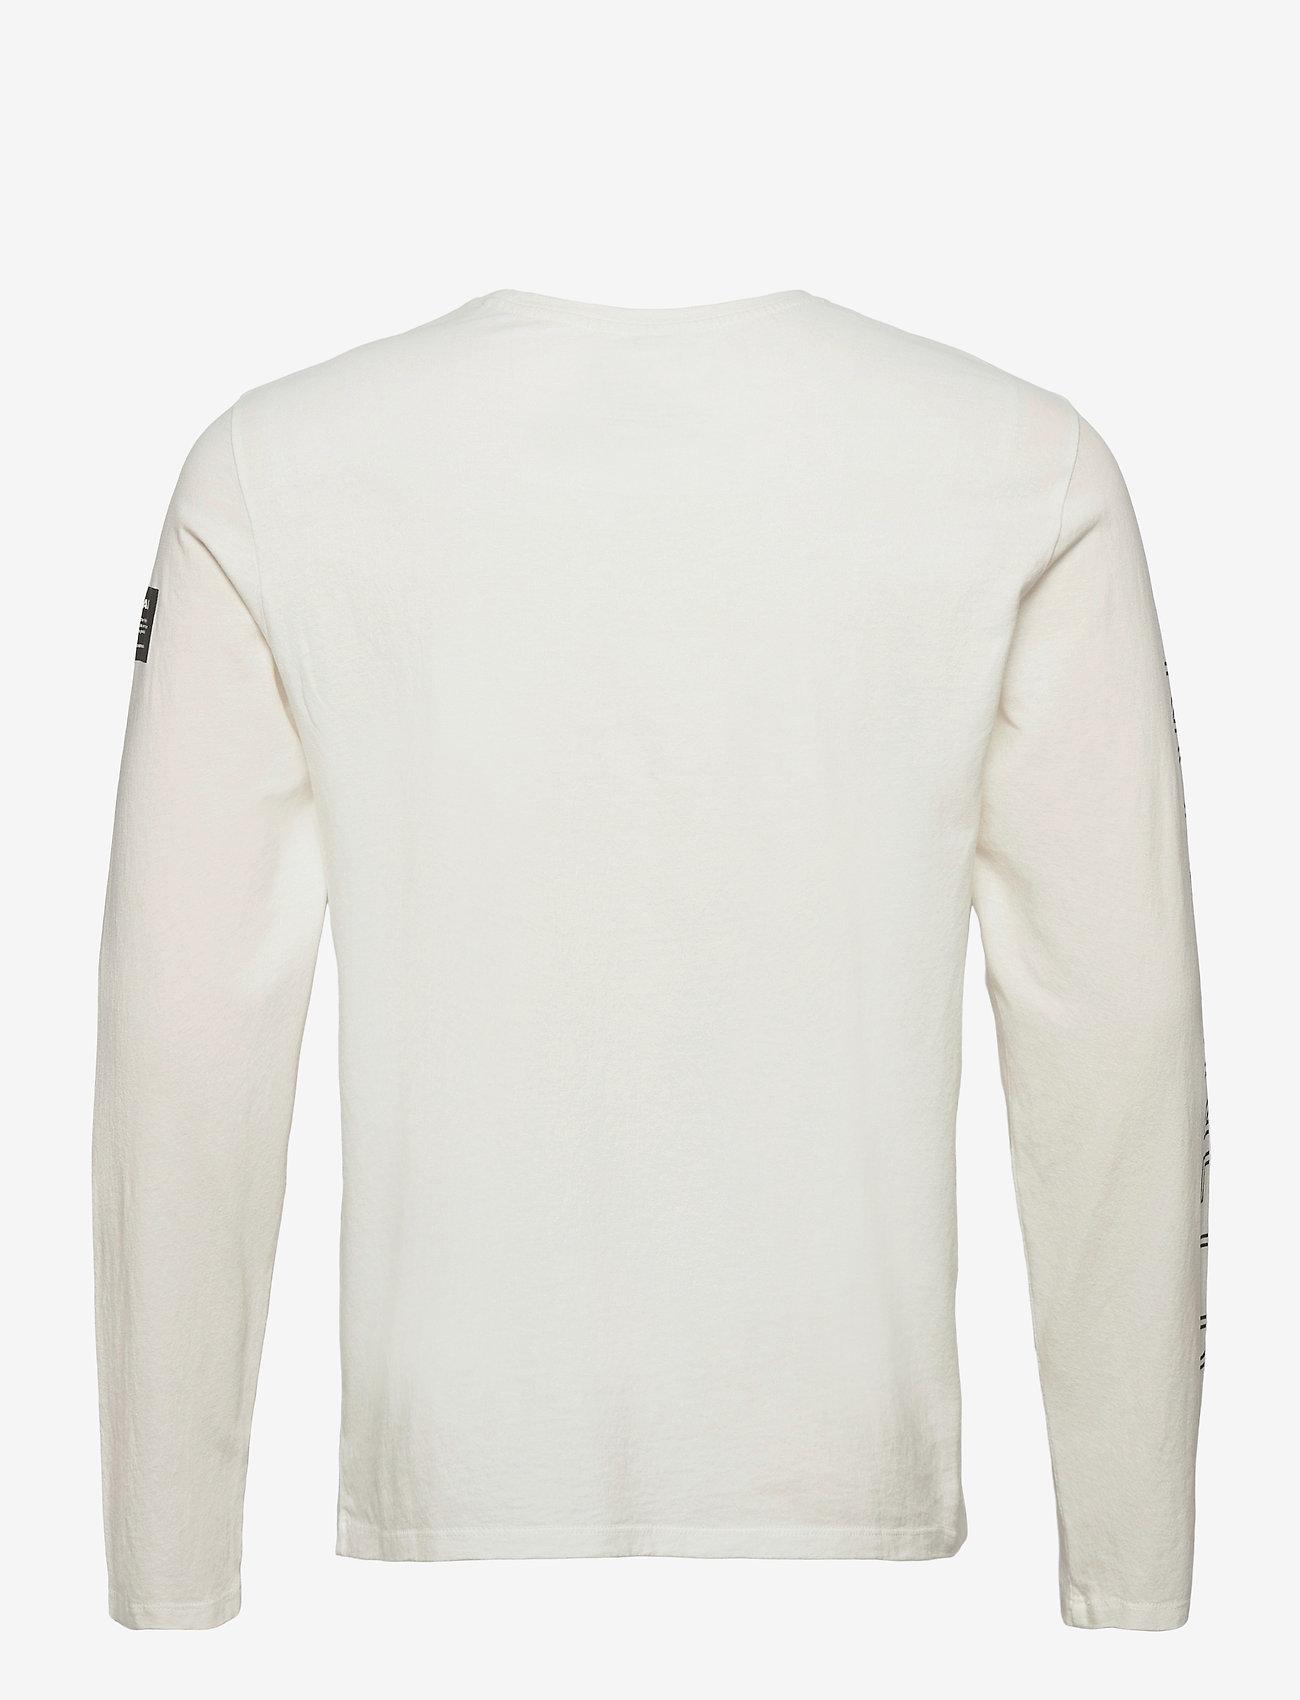 ECOALF - NANKIN LONG SLEEVE T-SHIRT MAN - t-shirts basiques - off white - 1